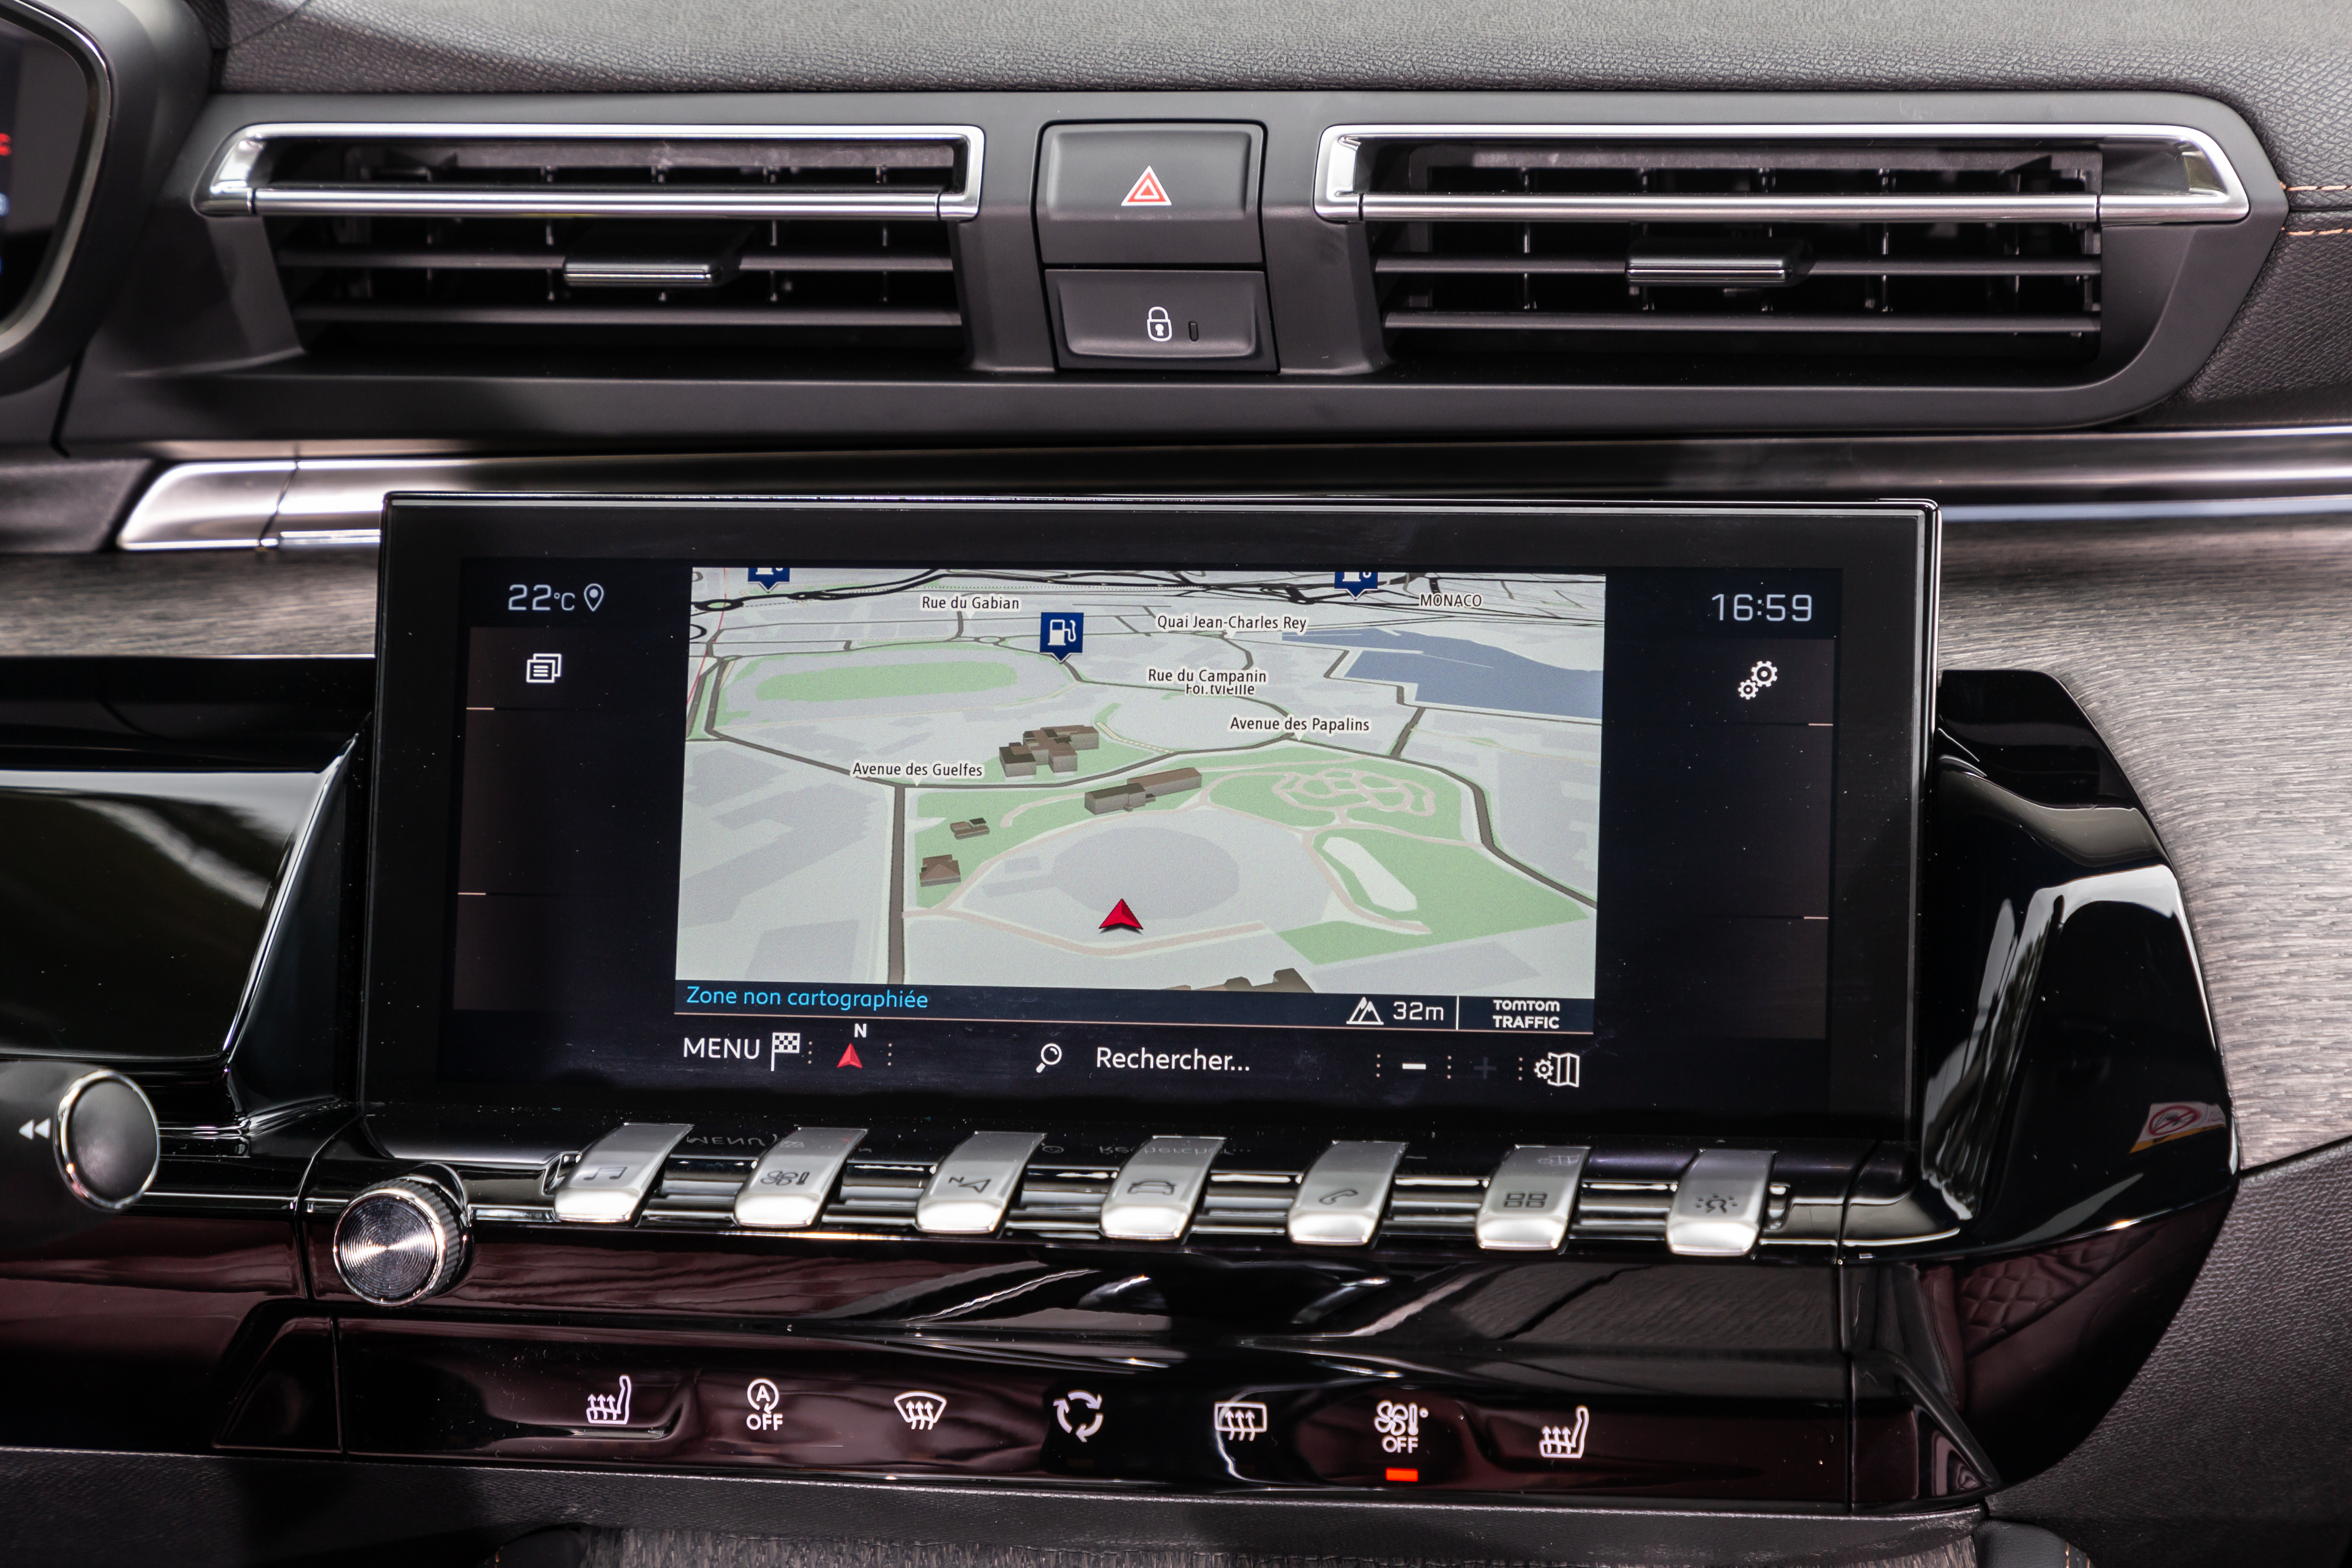 Peugeot-508-navigatore